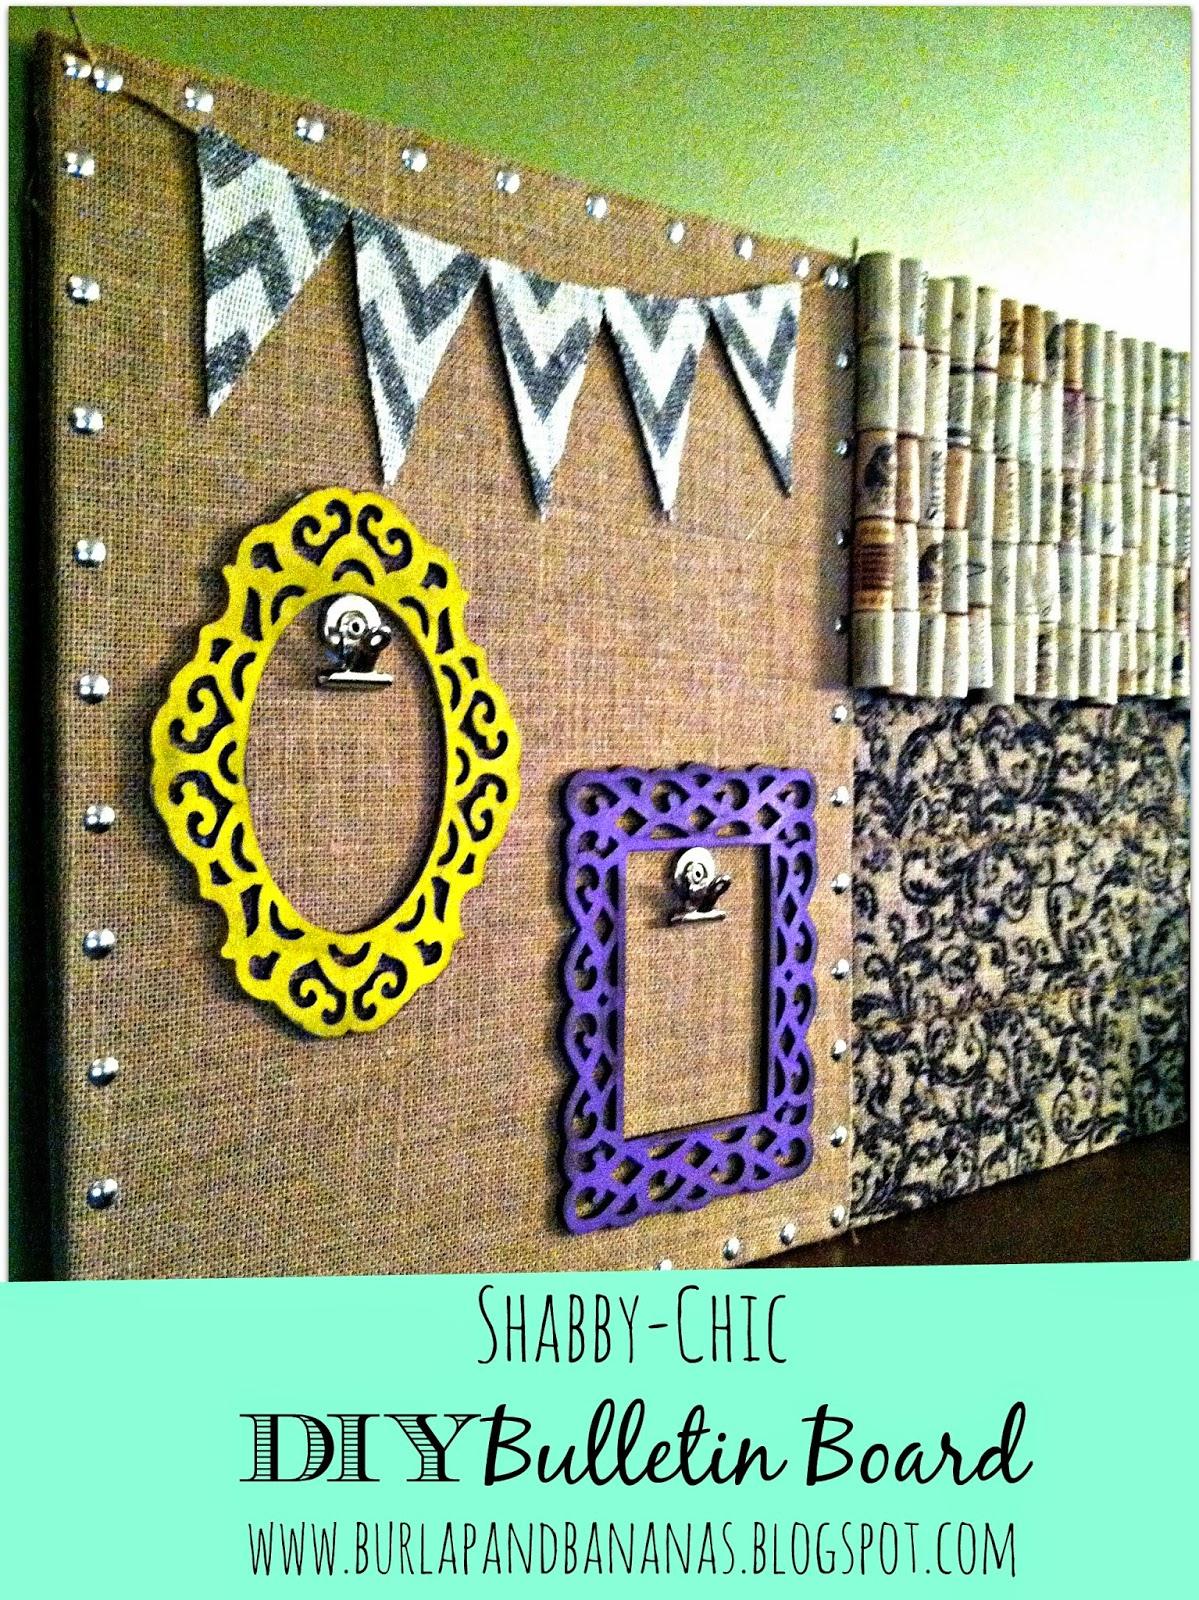 Burlap and Bananas: Shabby-Chic DIY Bulletin Board